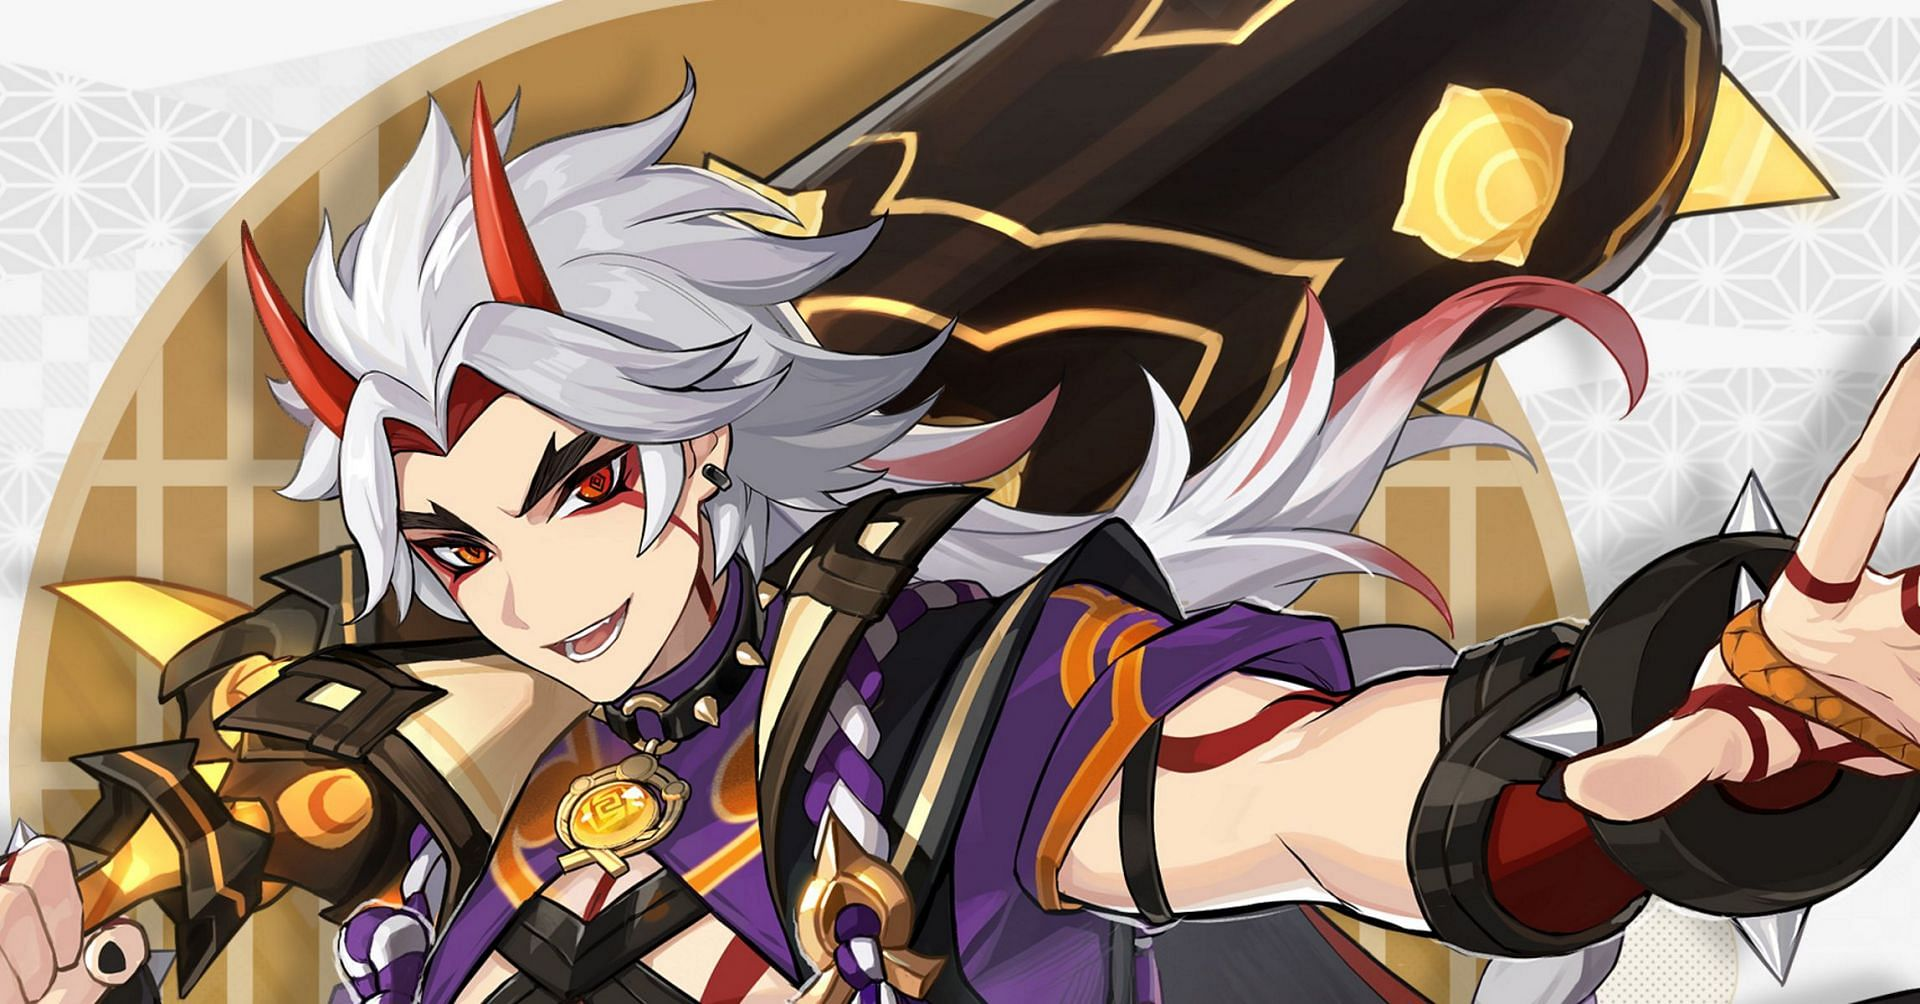 Itto's official art (Image via Genshin Impact)